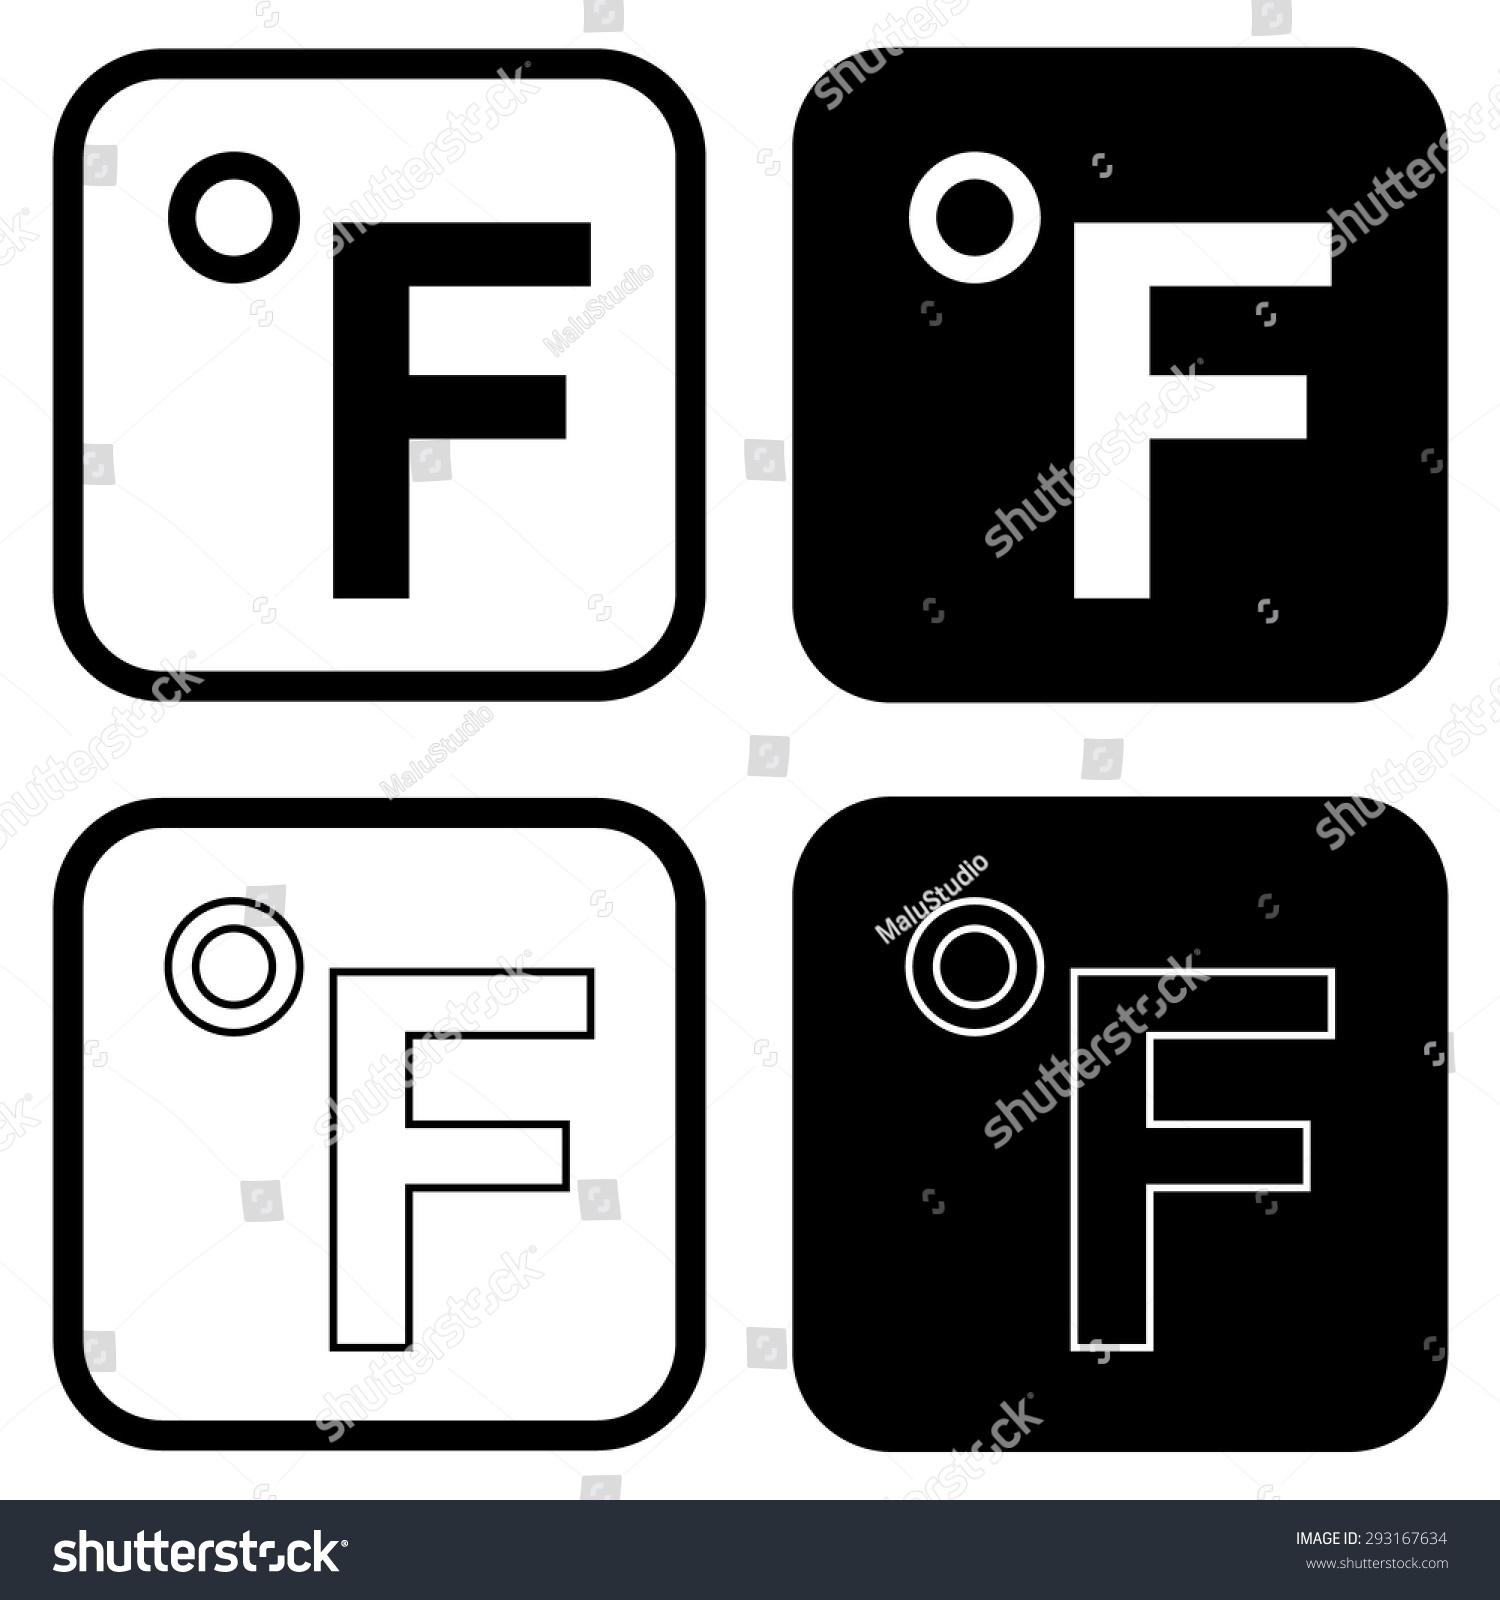 Fahrenheit icon stock vector 293167634 shutterstock fahrenheit icon biocorpaavc Choice Image